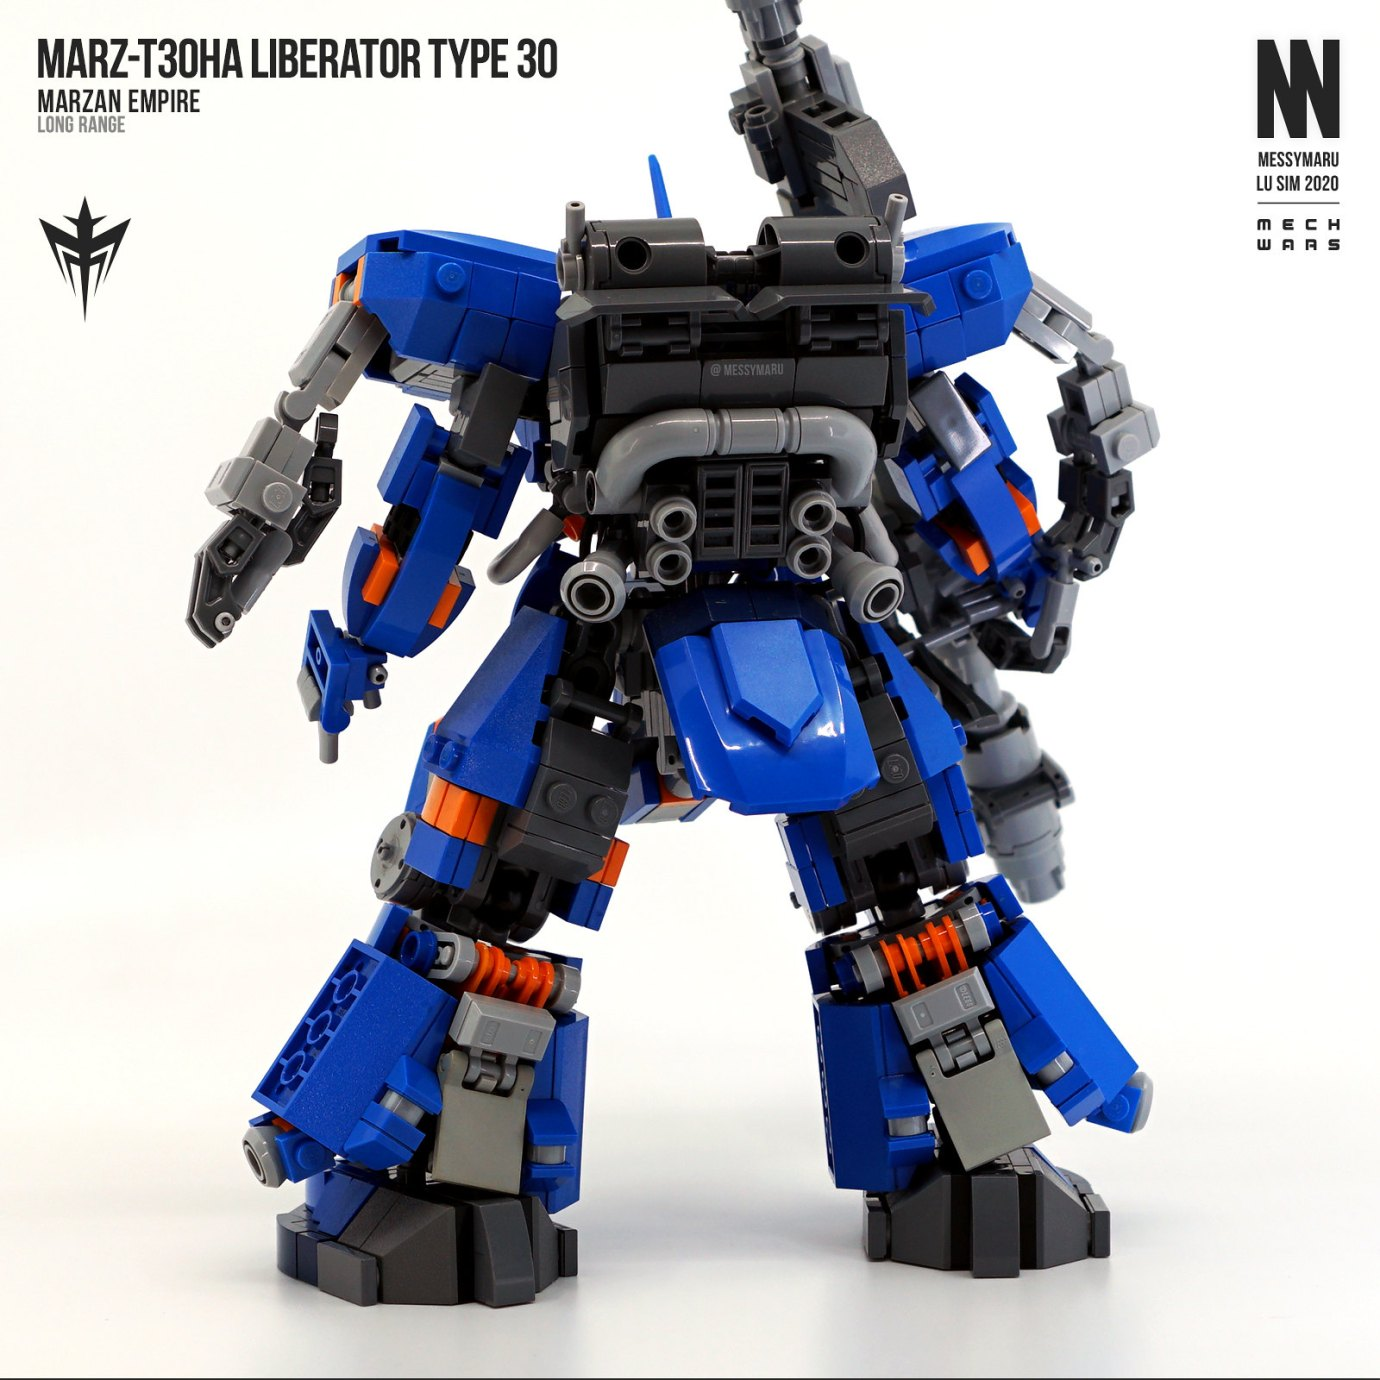 MARZ-T30HA Liberator Type 30